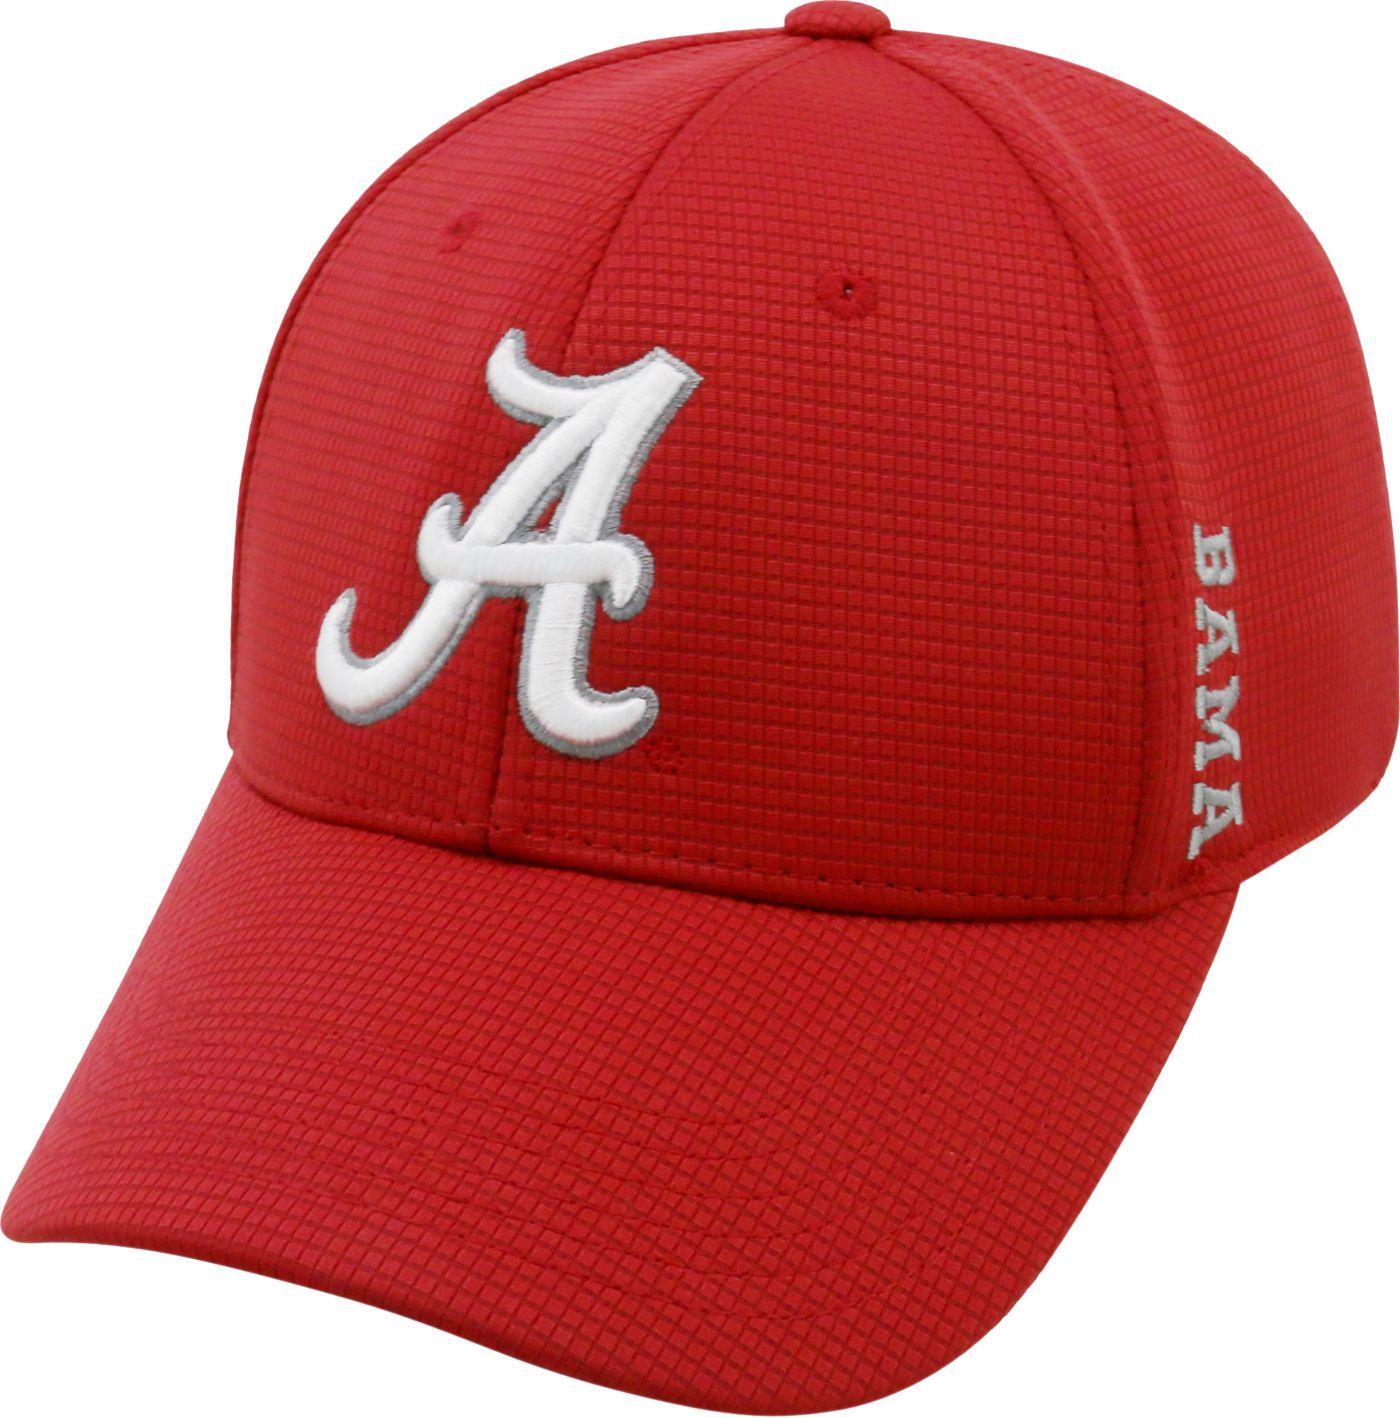 Top of the World Men's Alabama Crimson Tide Crimson Booster Plus 1Fit Flex Hat